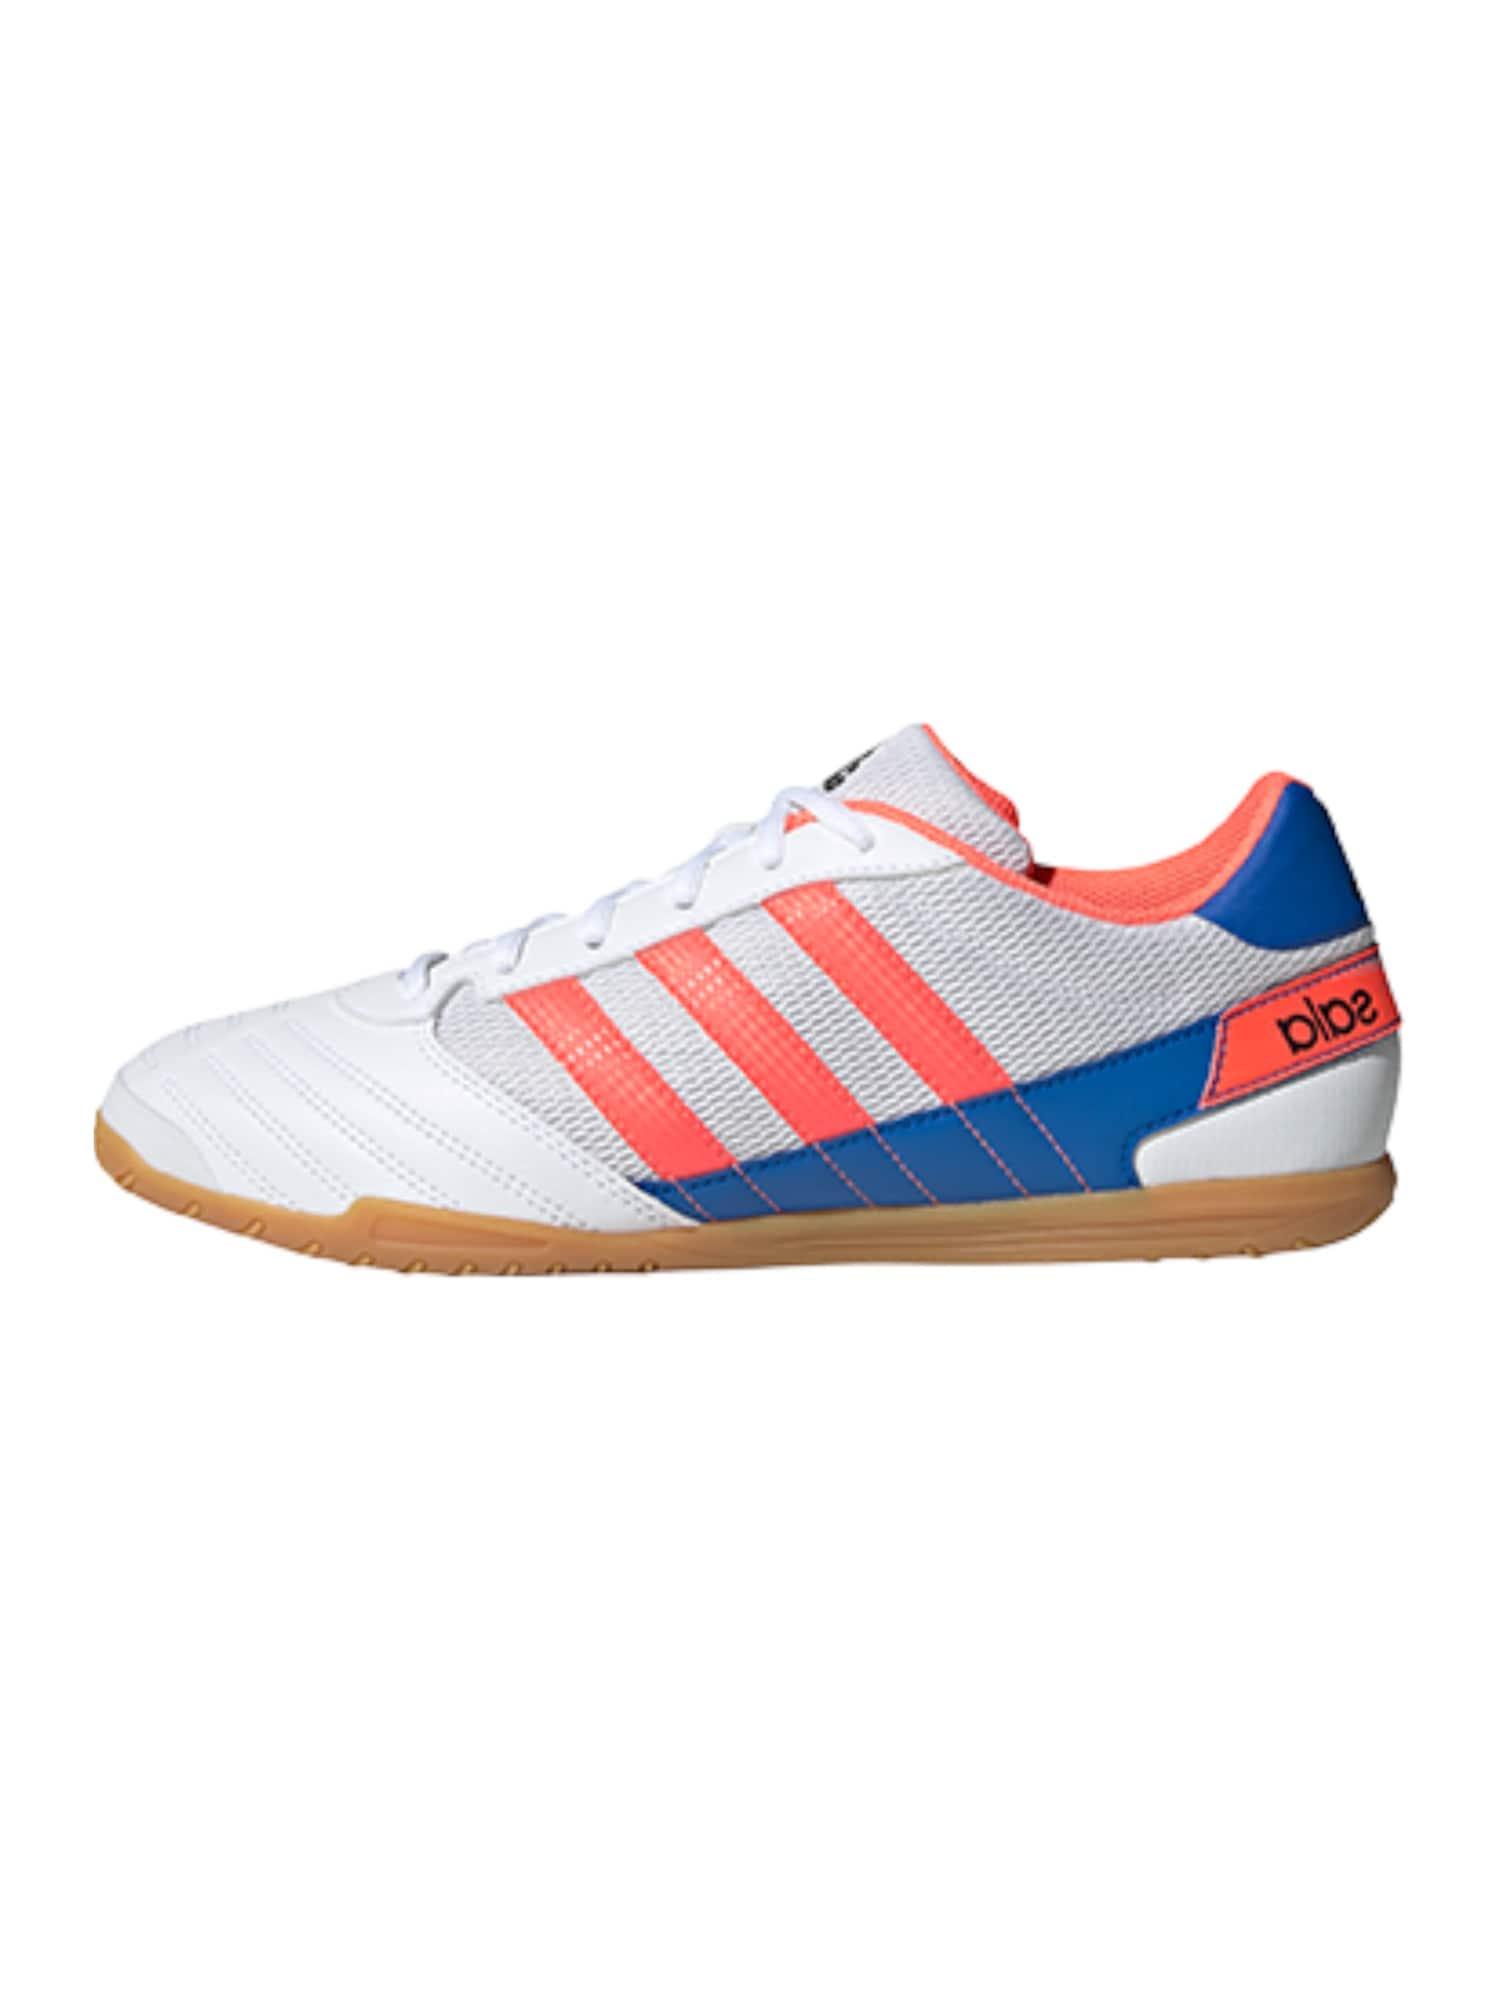 ADIDAS PERFORMANCE Futbolo bateliai balta / raudona / mėlyna